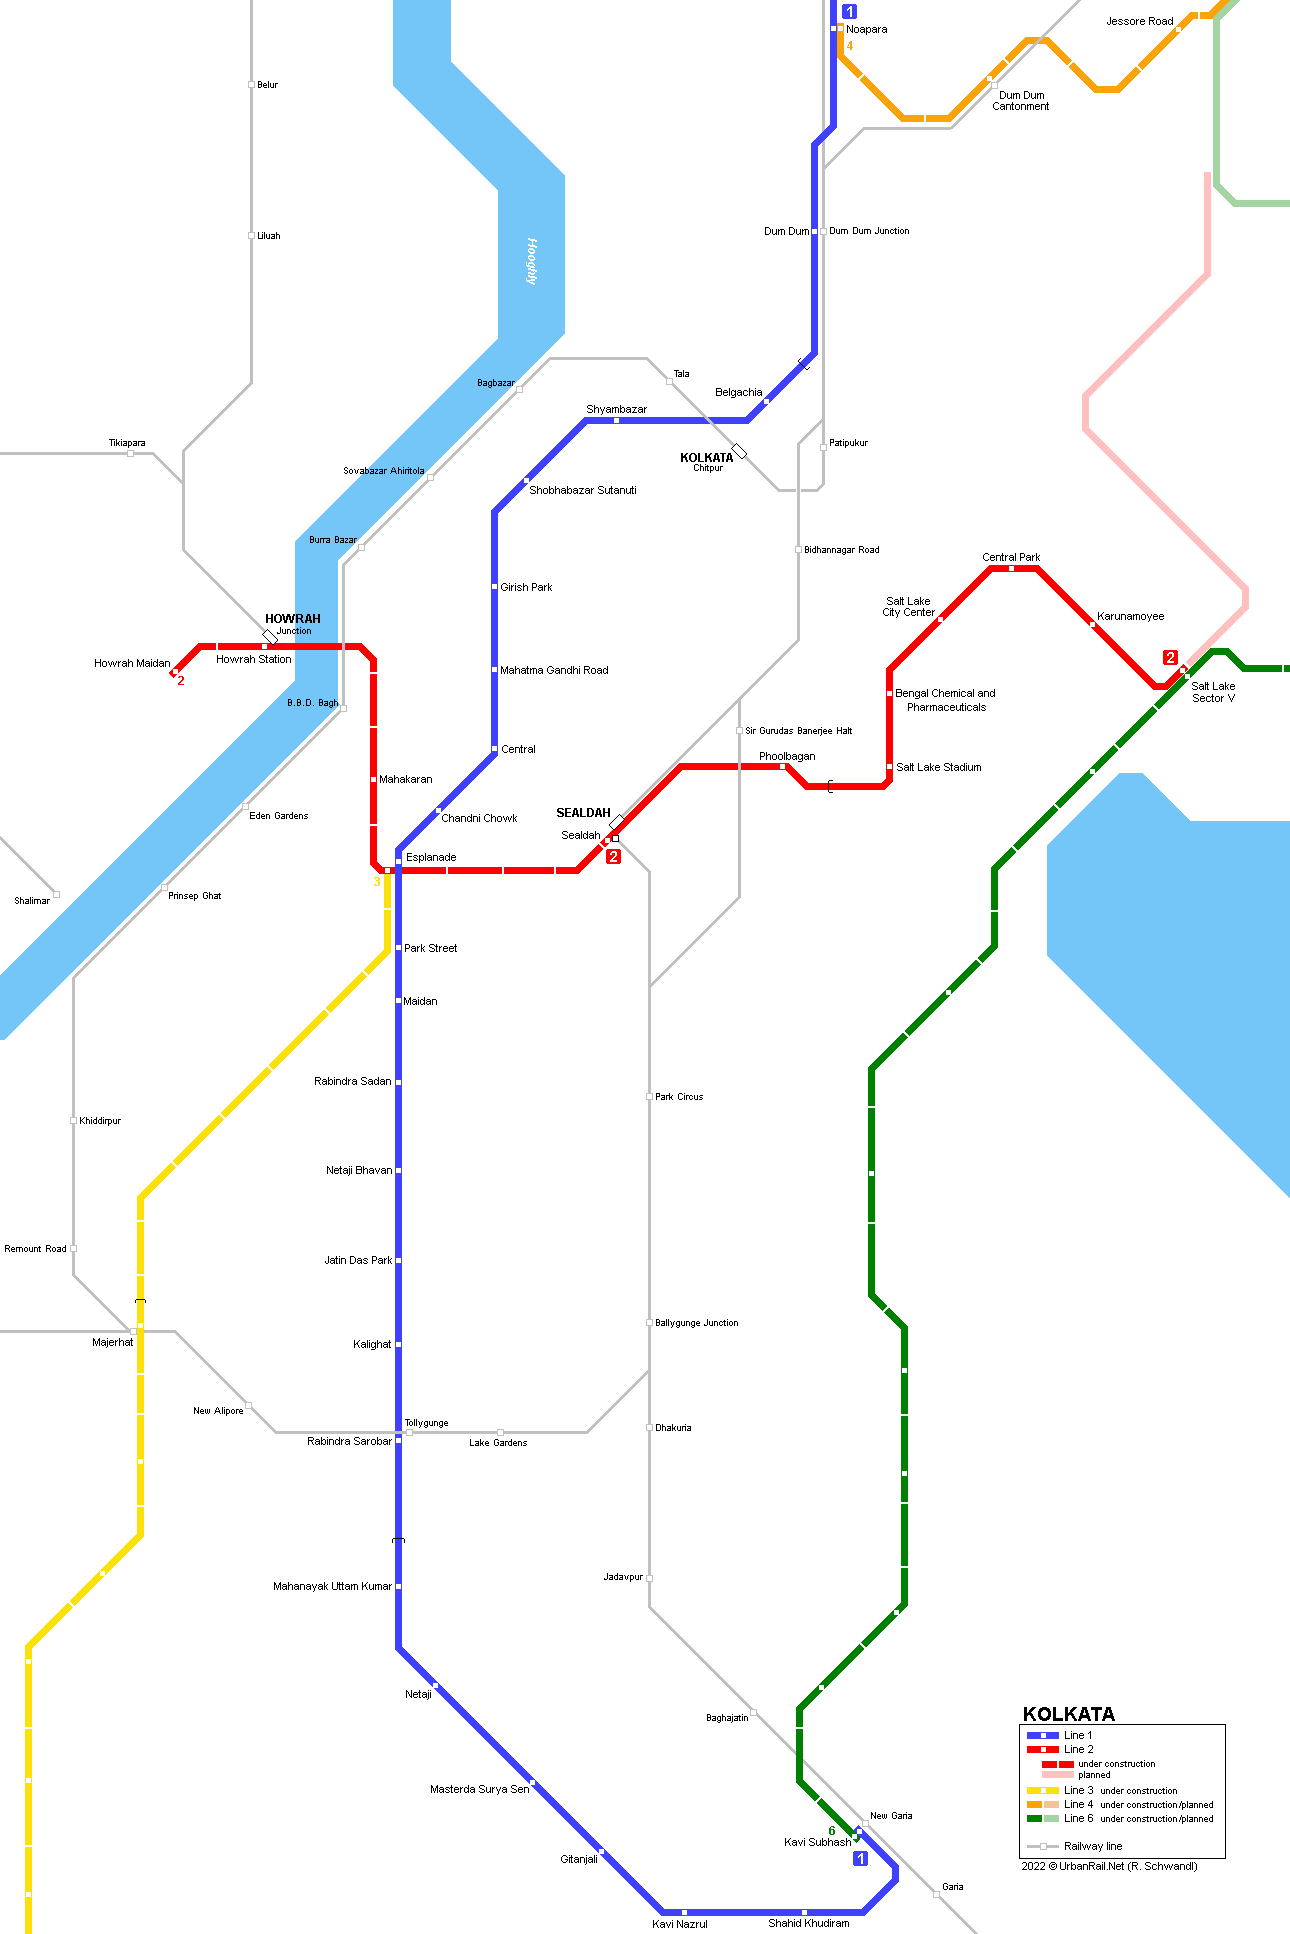 Subway Map Example Basic.Urbanrail Net Asia India West Bengal Kolkata Calcutta Metro